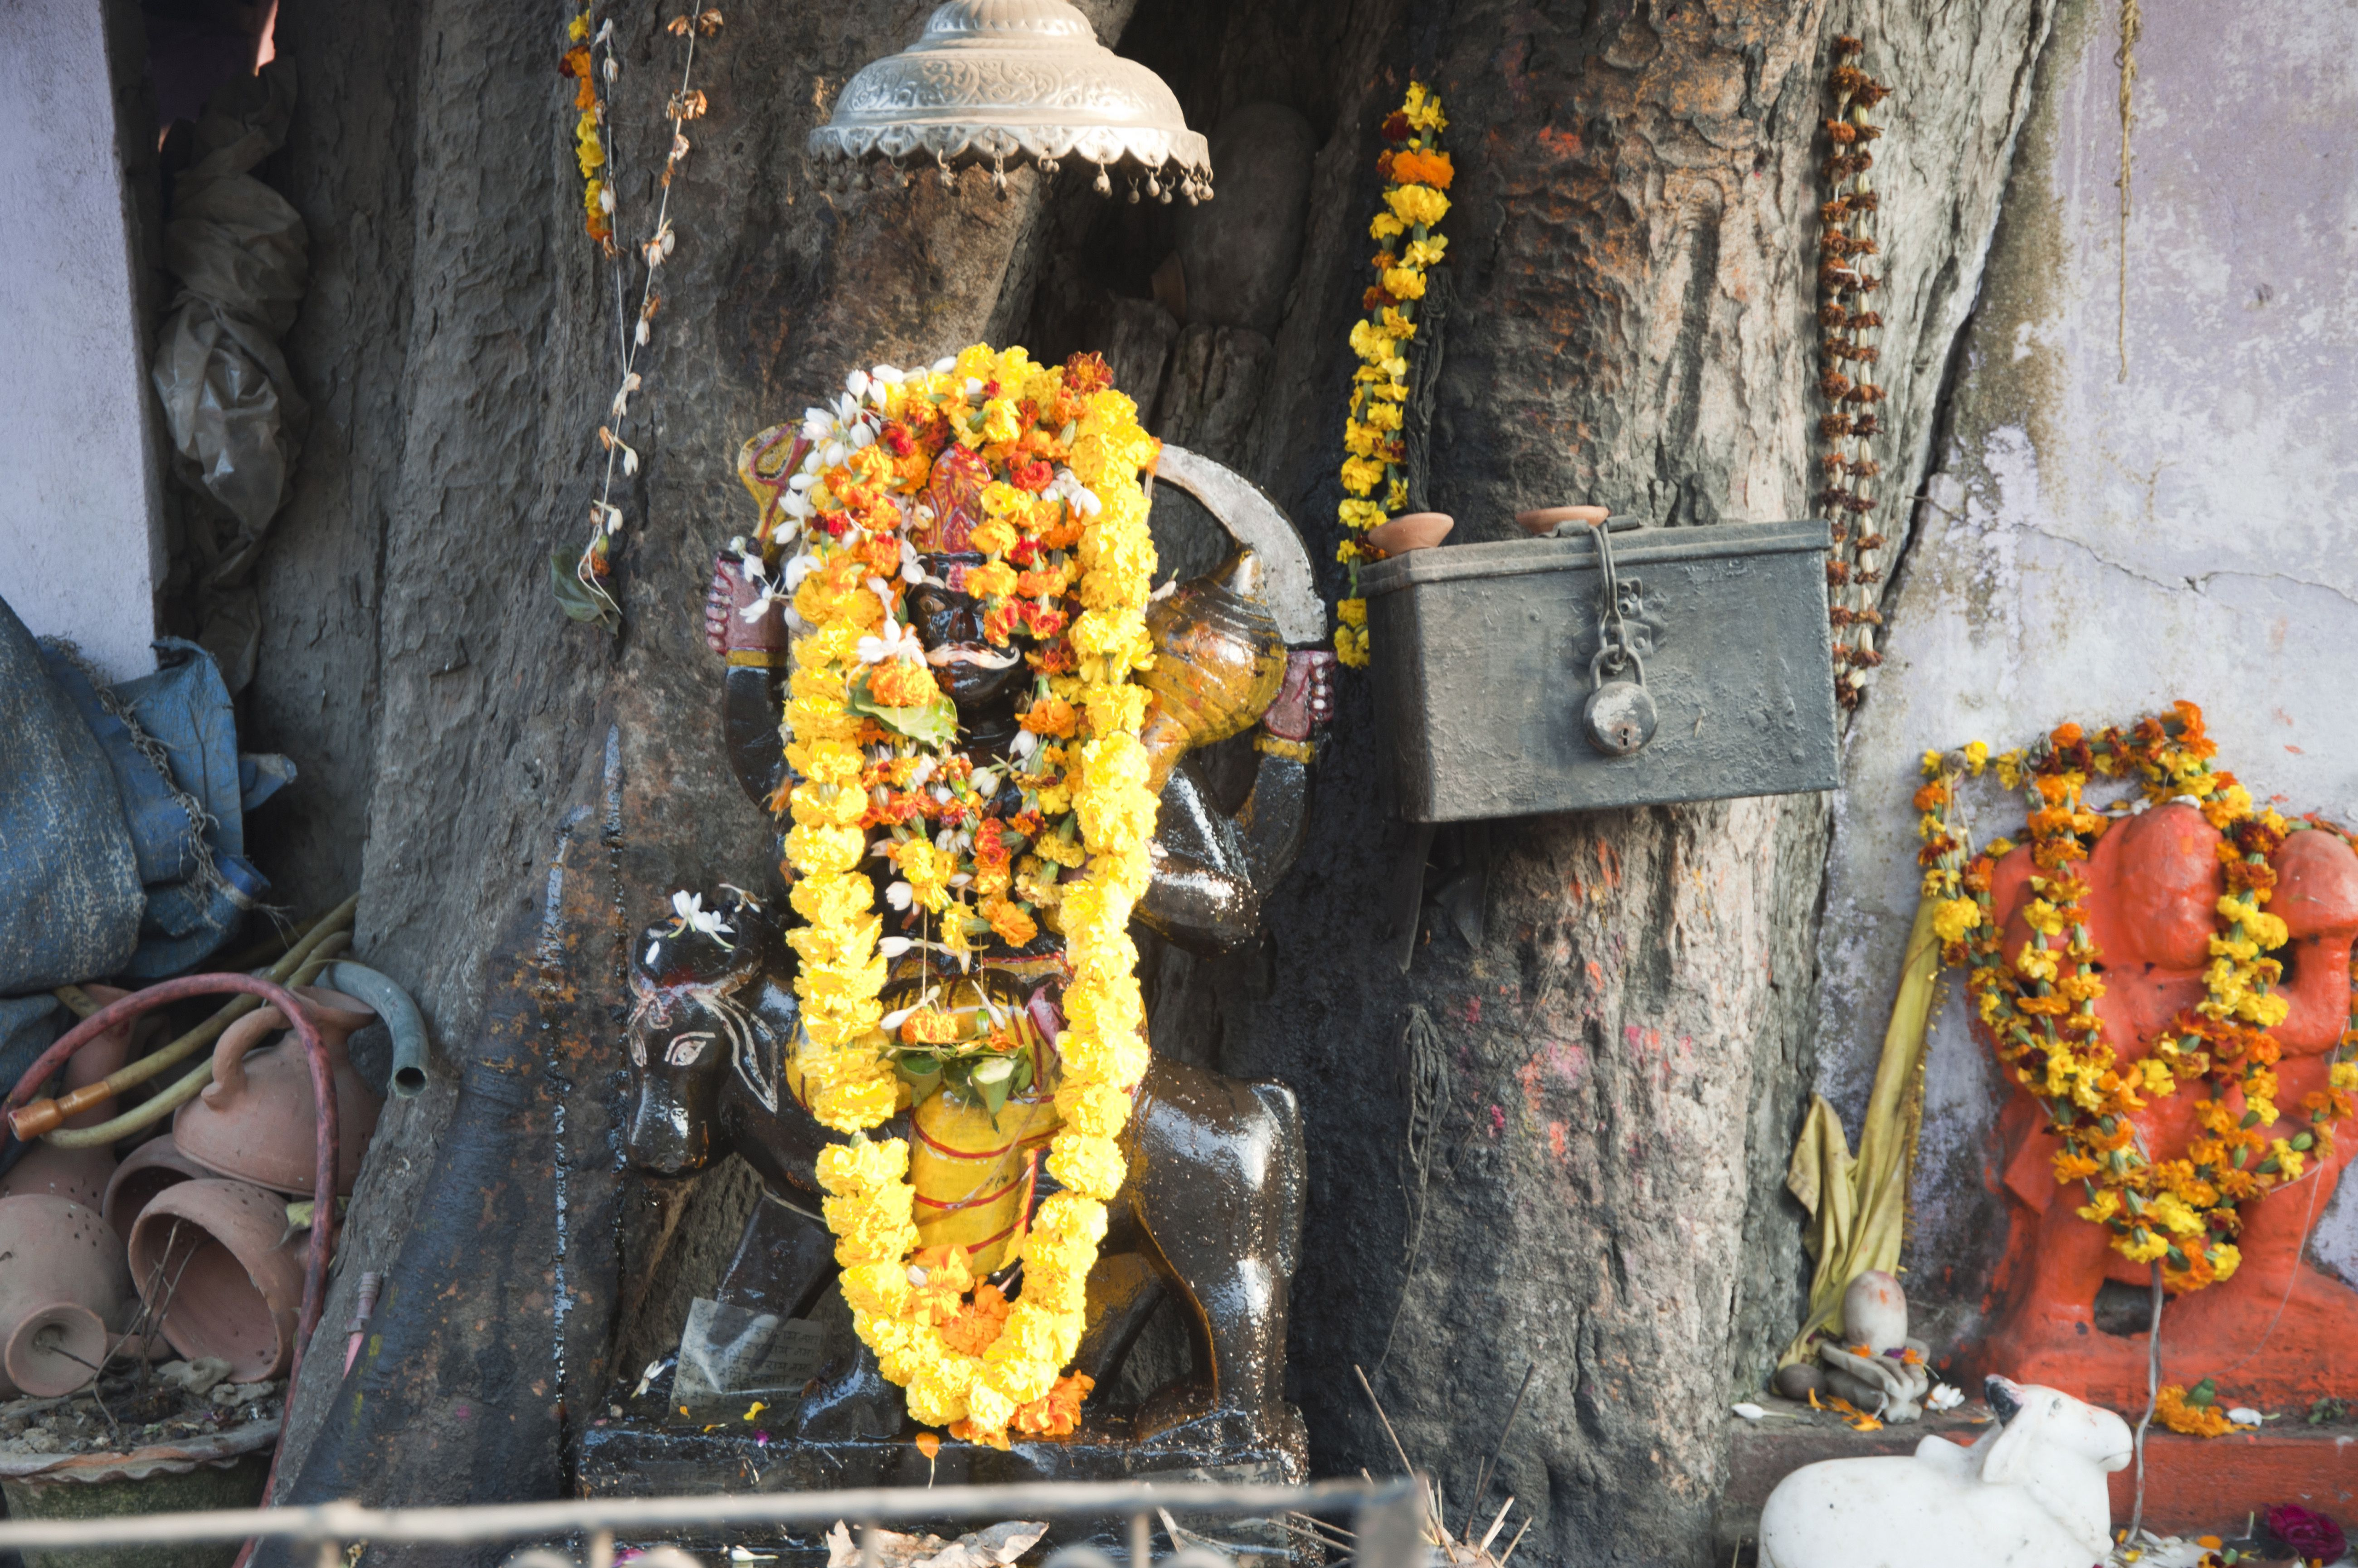 Lord shani dev and hanuman under the tree, allahabad, uttar pradesh, India